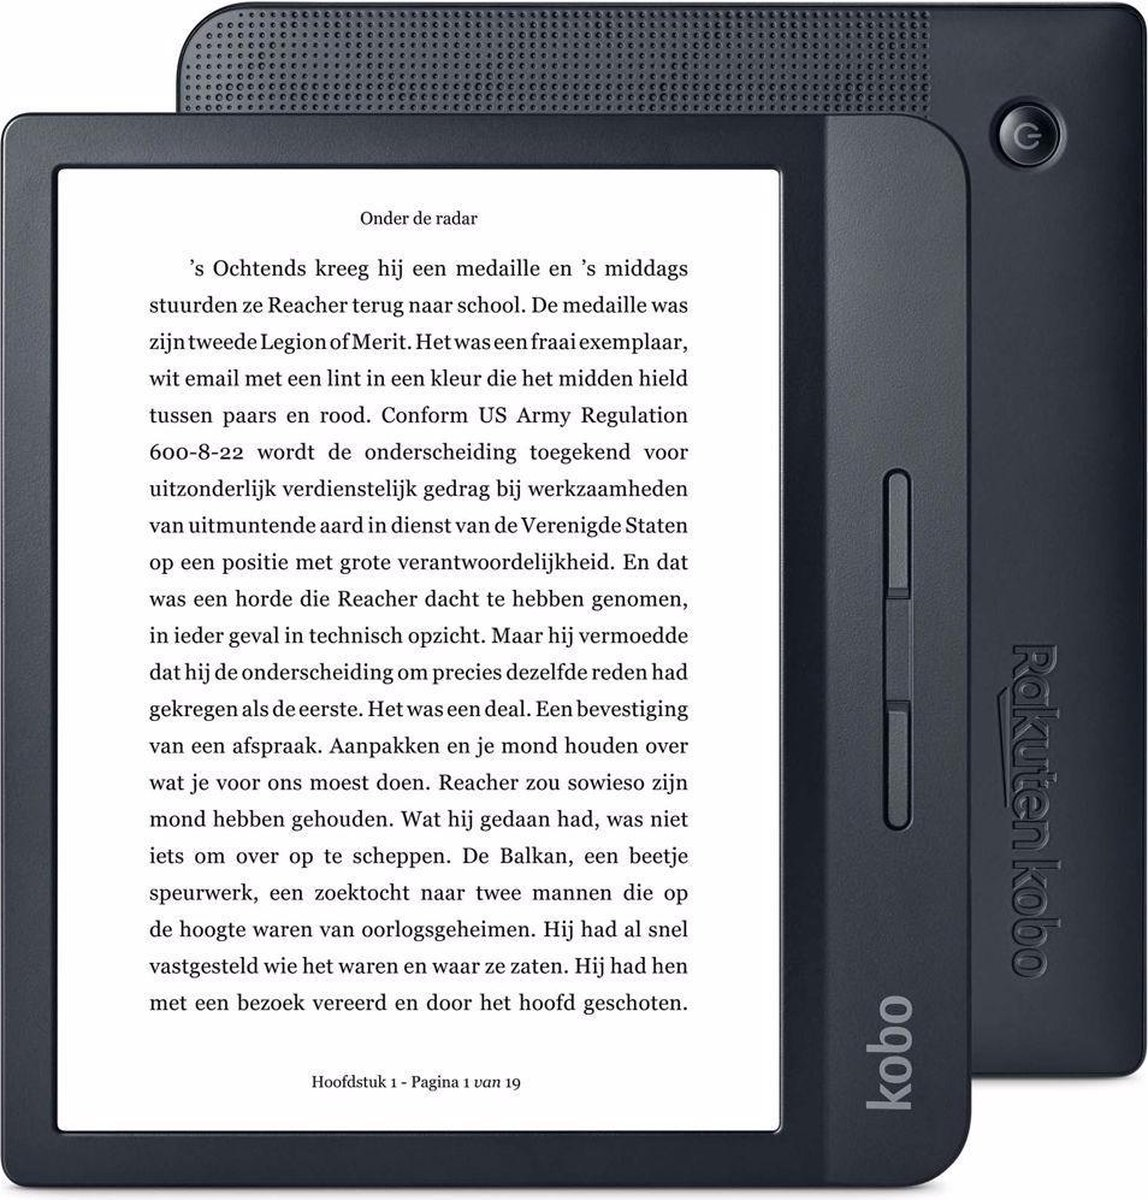 Kobo Libra H2O e-reader - Waterdicht - Grote 7 inch scherm - Instelbaar warme kleur - 8GB - Wifi - Z